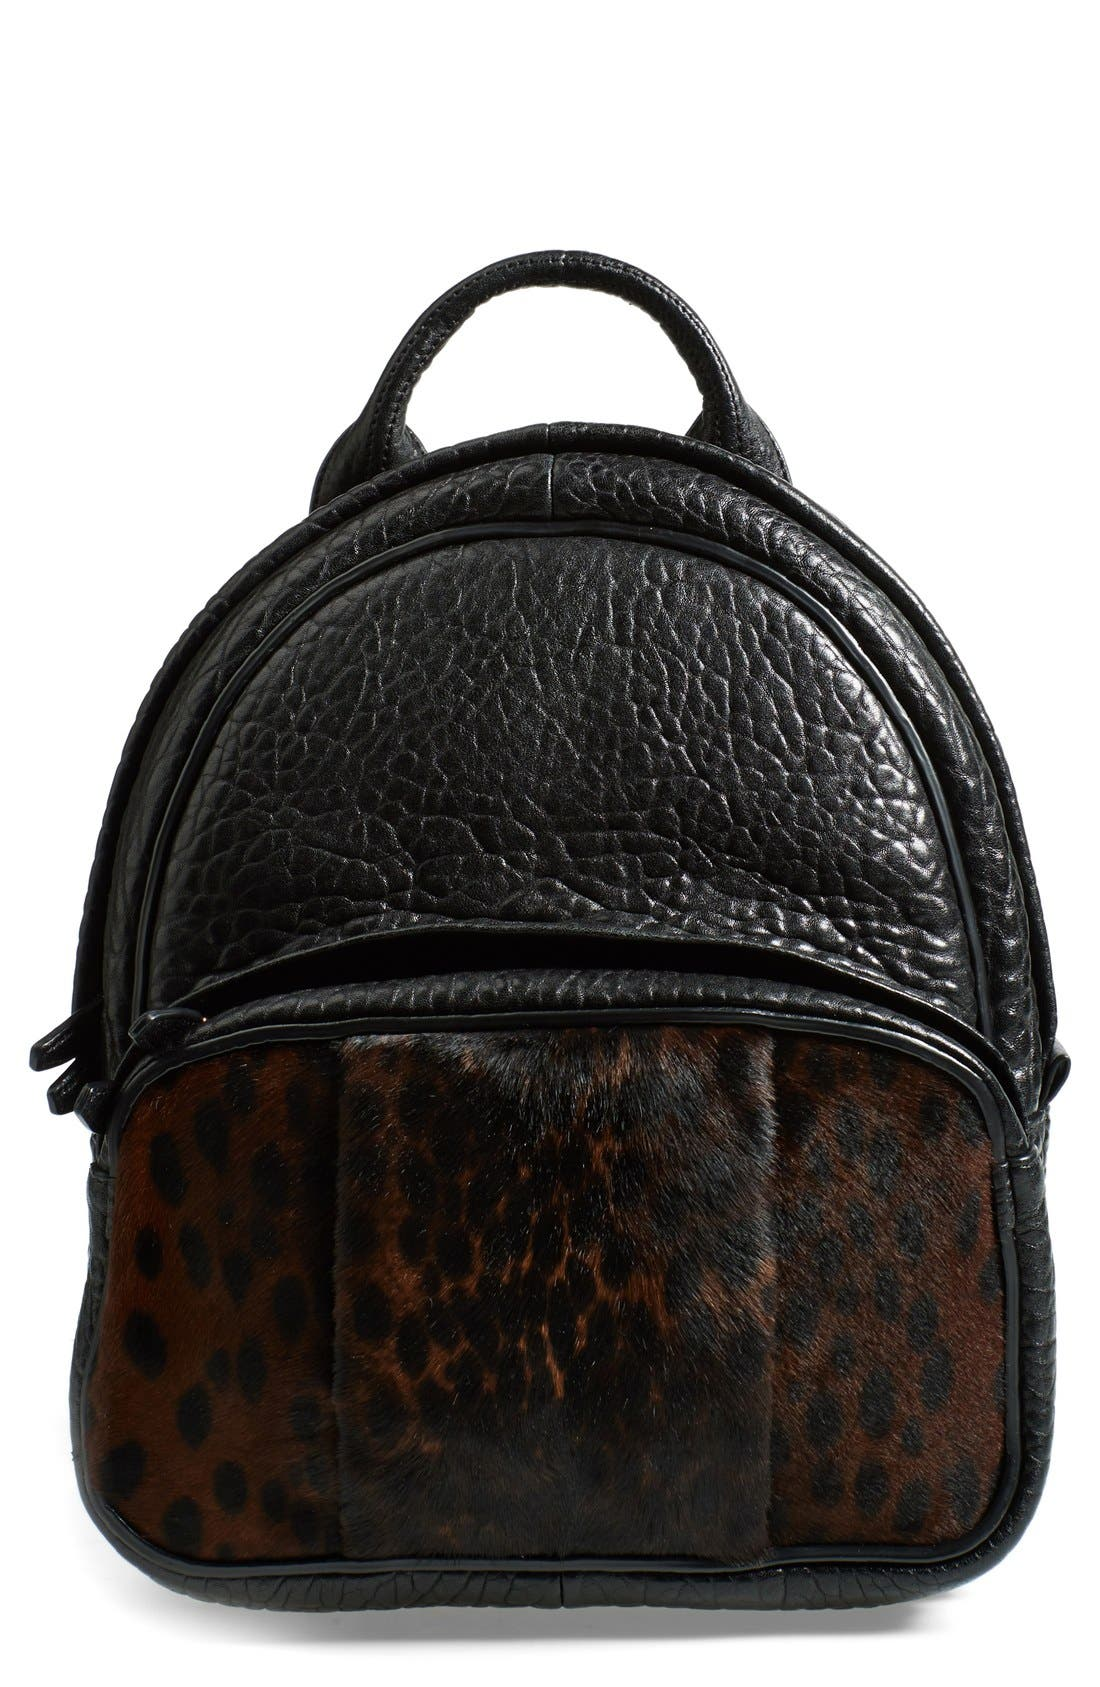 Alternate Image 1 Selected - Alexander Wang 'Dumbo' Leather & Calf Hair Backpack